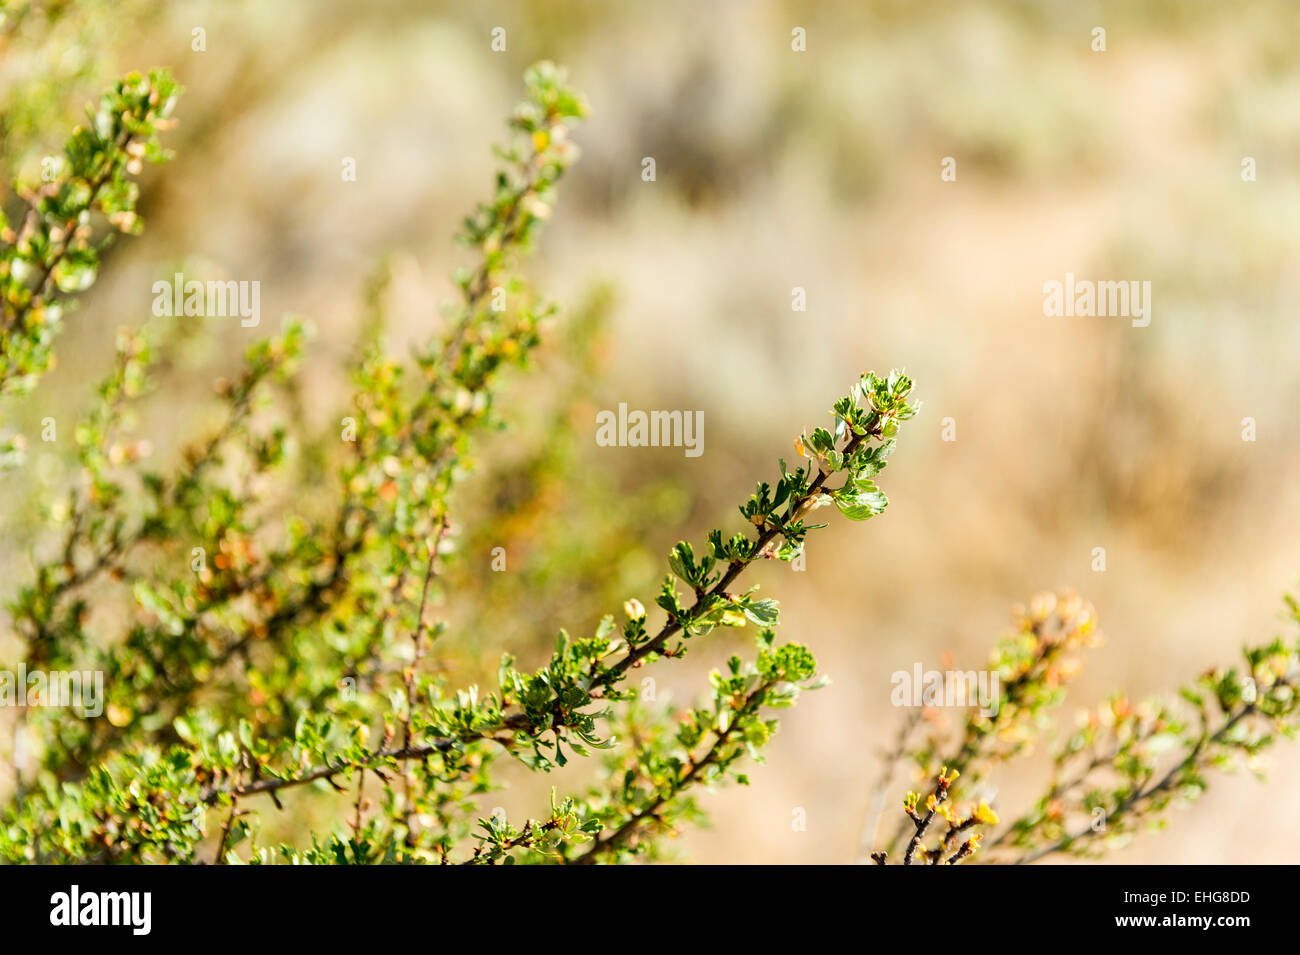 Antelope brush detail, Osoyoos Desert Centre, Osoyoos, British Columbia, Canada - Stock Image